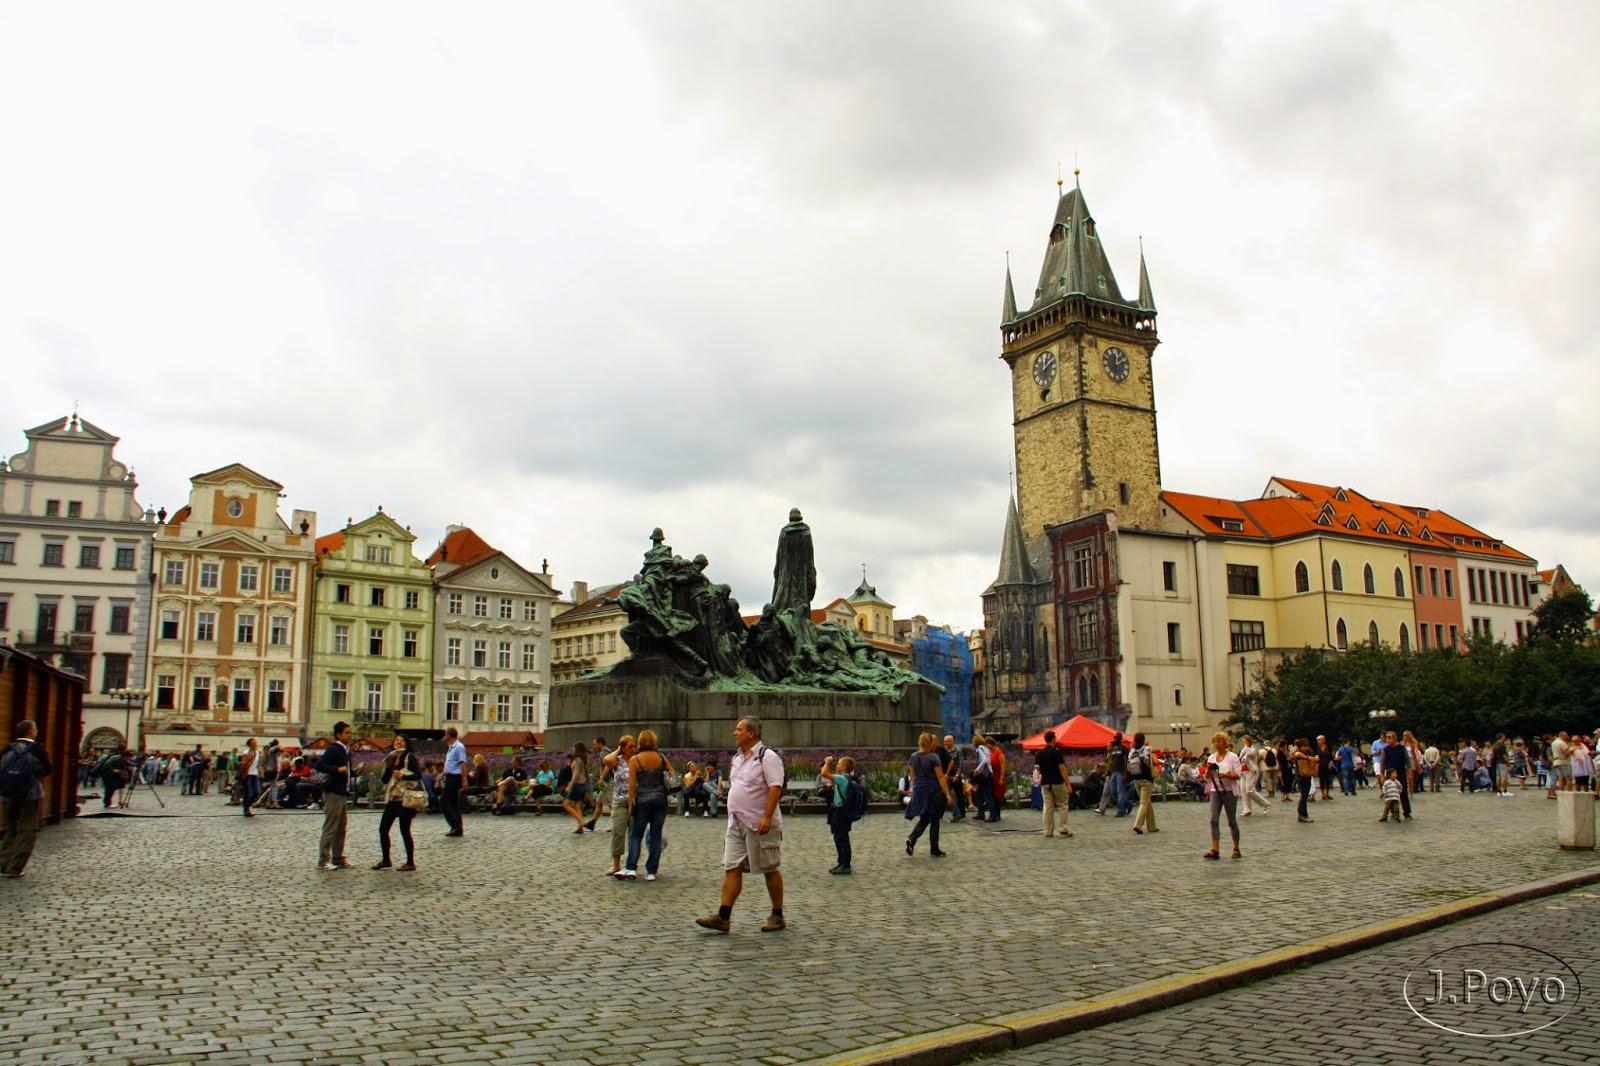 Monumento a Jan Hus de Praga